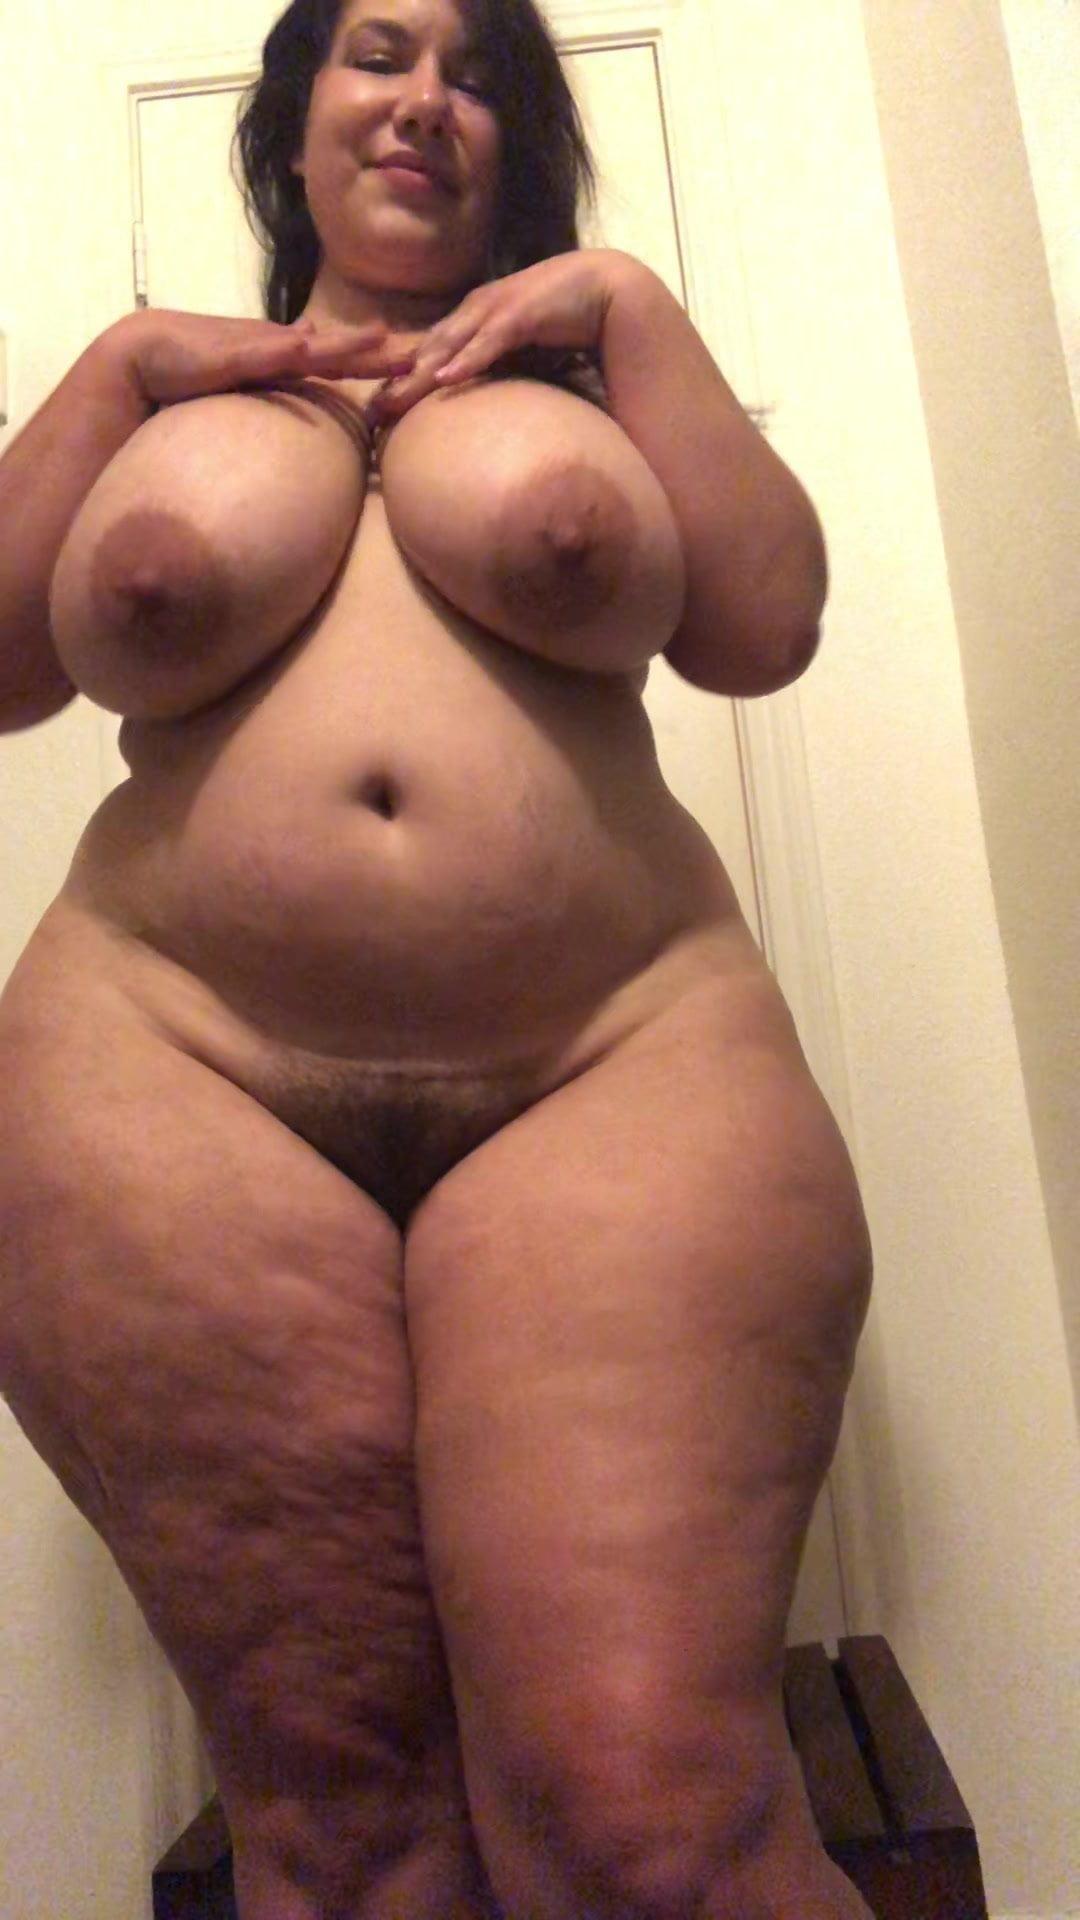 Jessica weaver porno